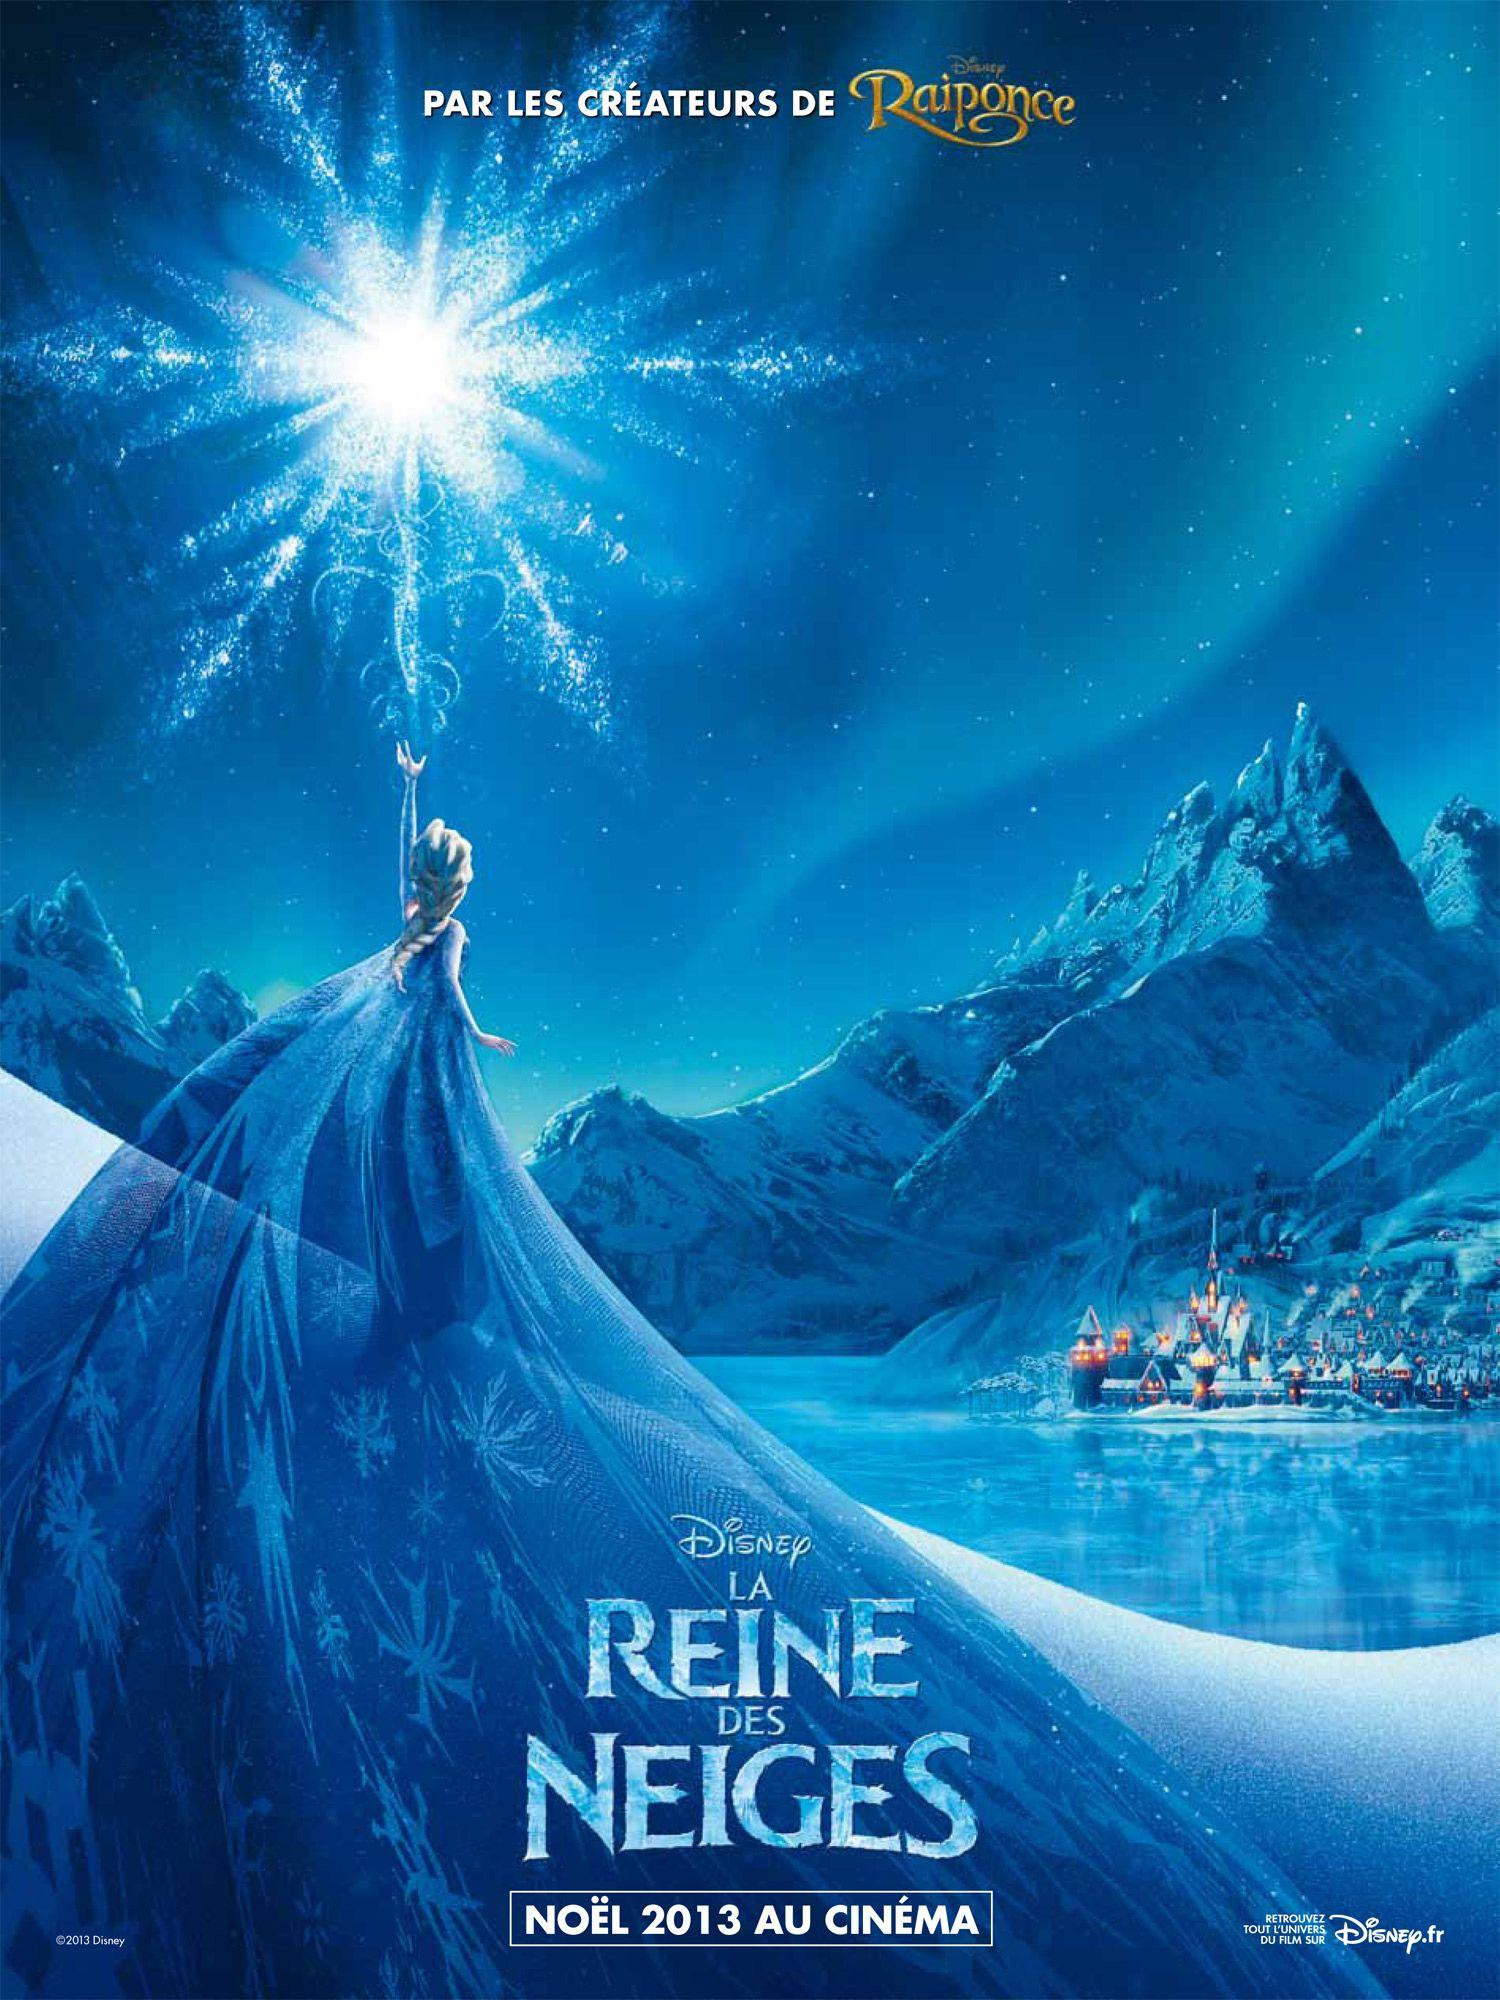 la reine des neiges vo streaming - La Reine Des Neige En Streaming